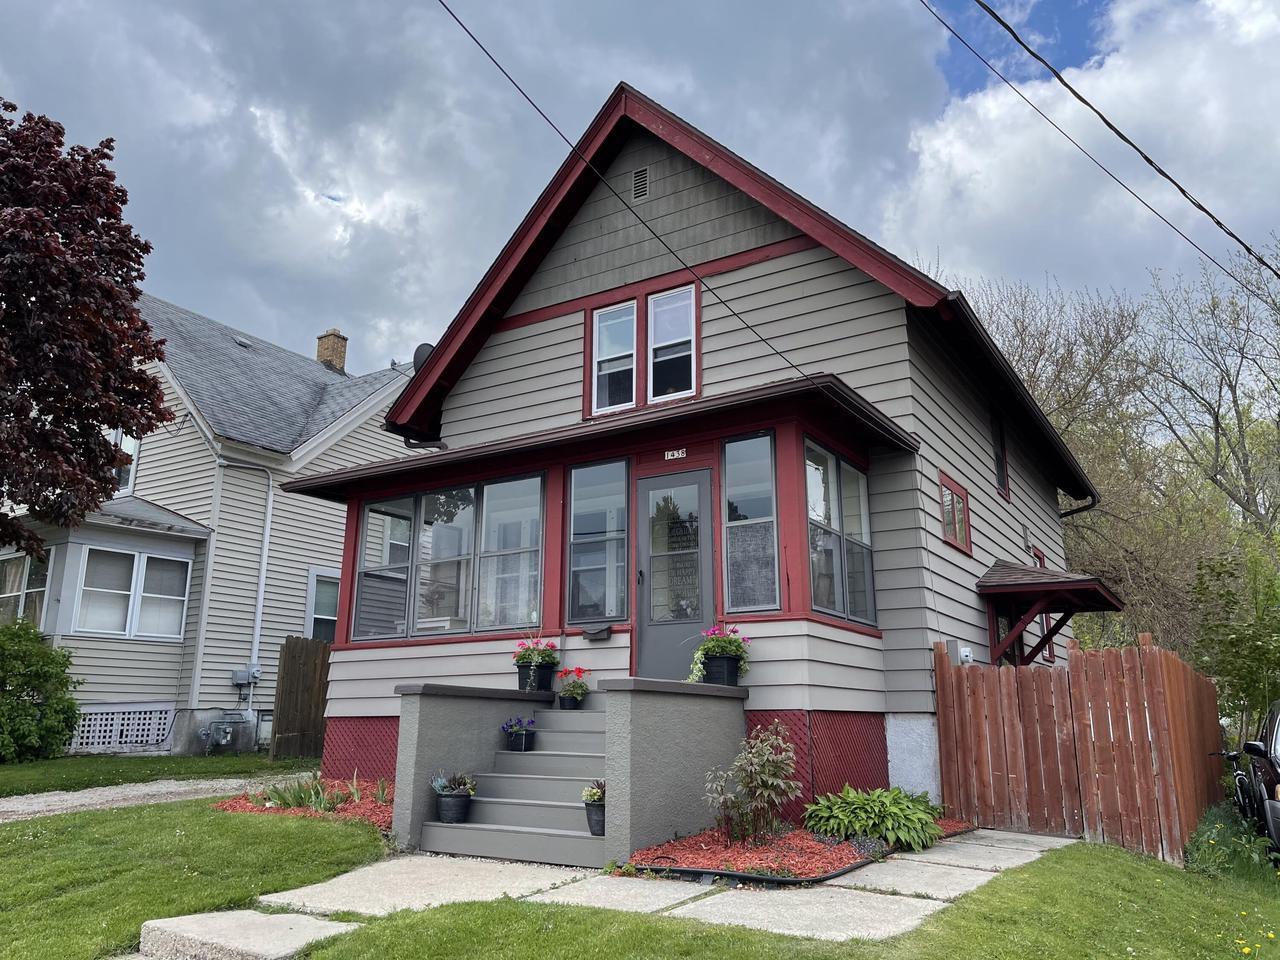 1438 Barton Ave AVENUE, WEST BEND, WI 53090